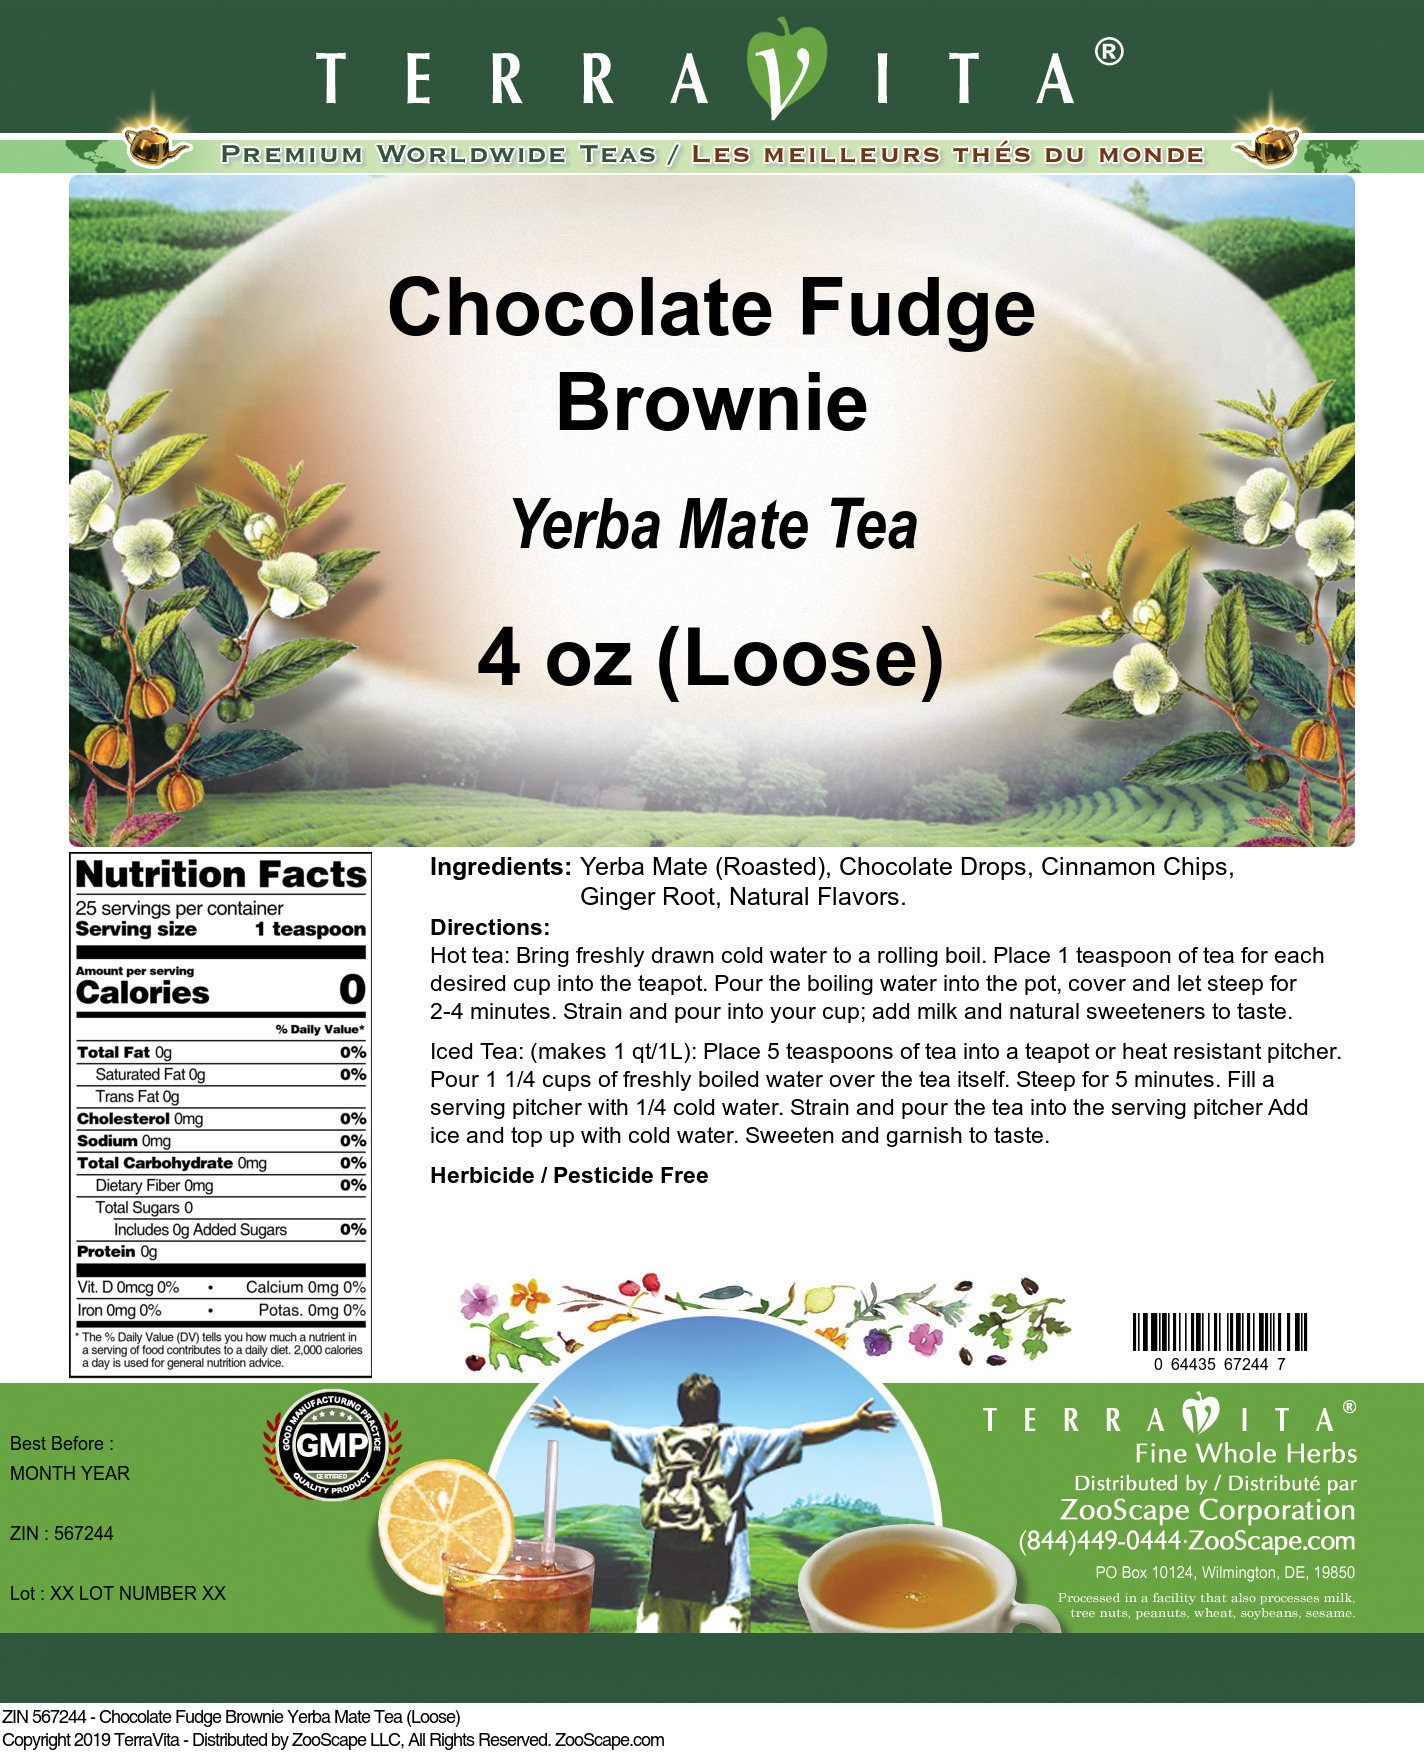 Chocolate Fudge Brownie Yerba Mate Tea (Loose)